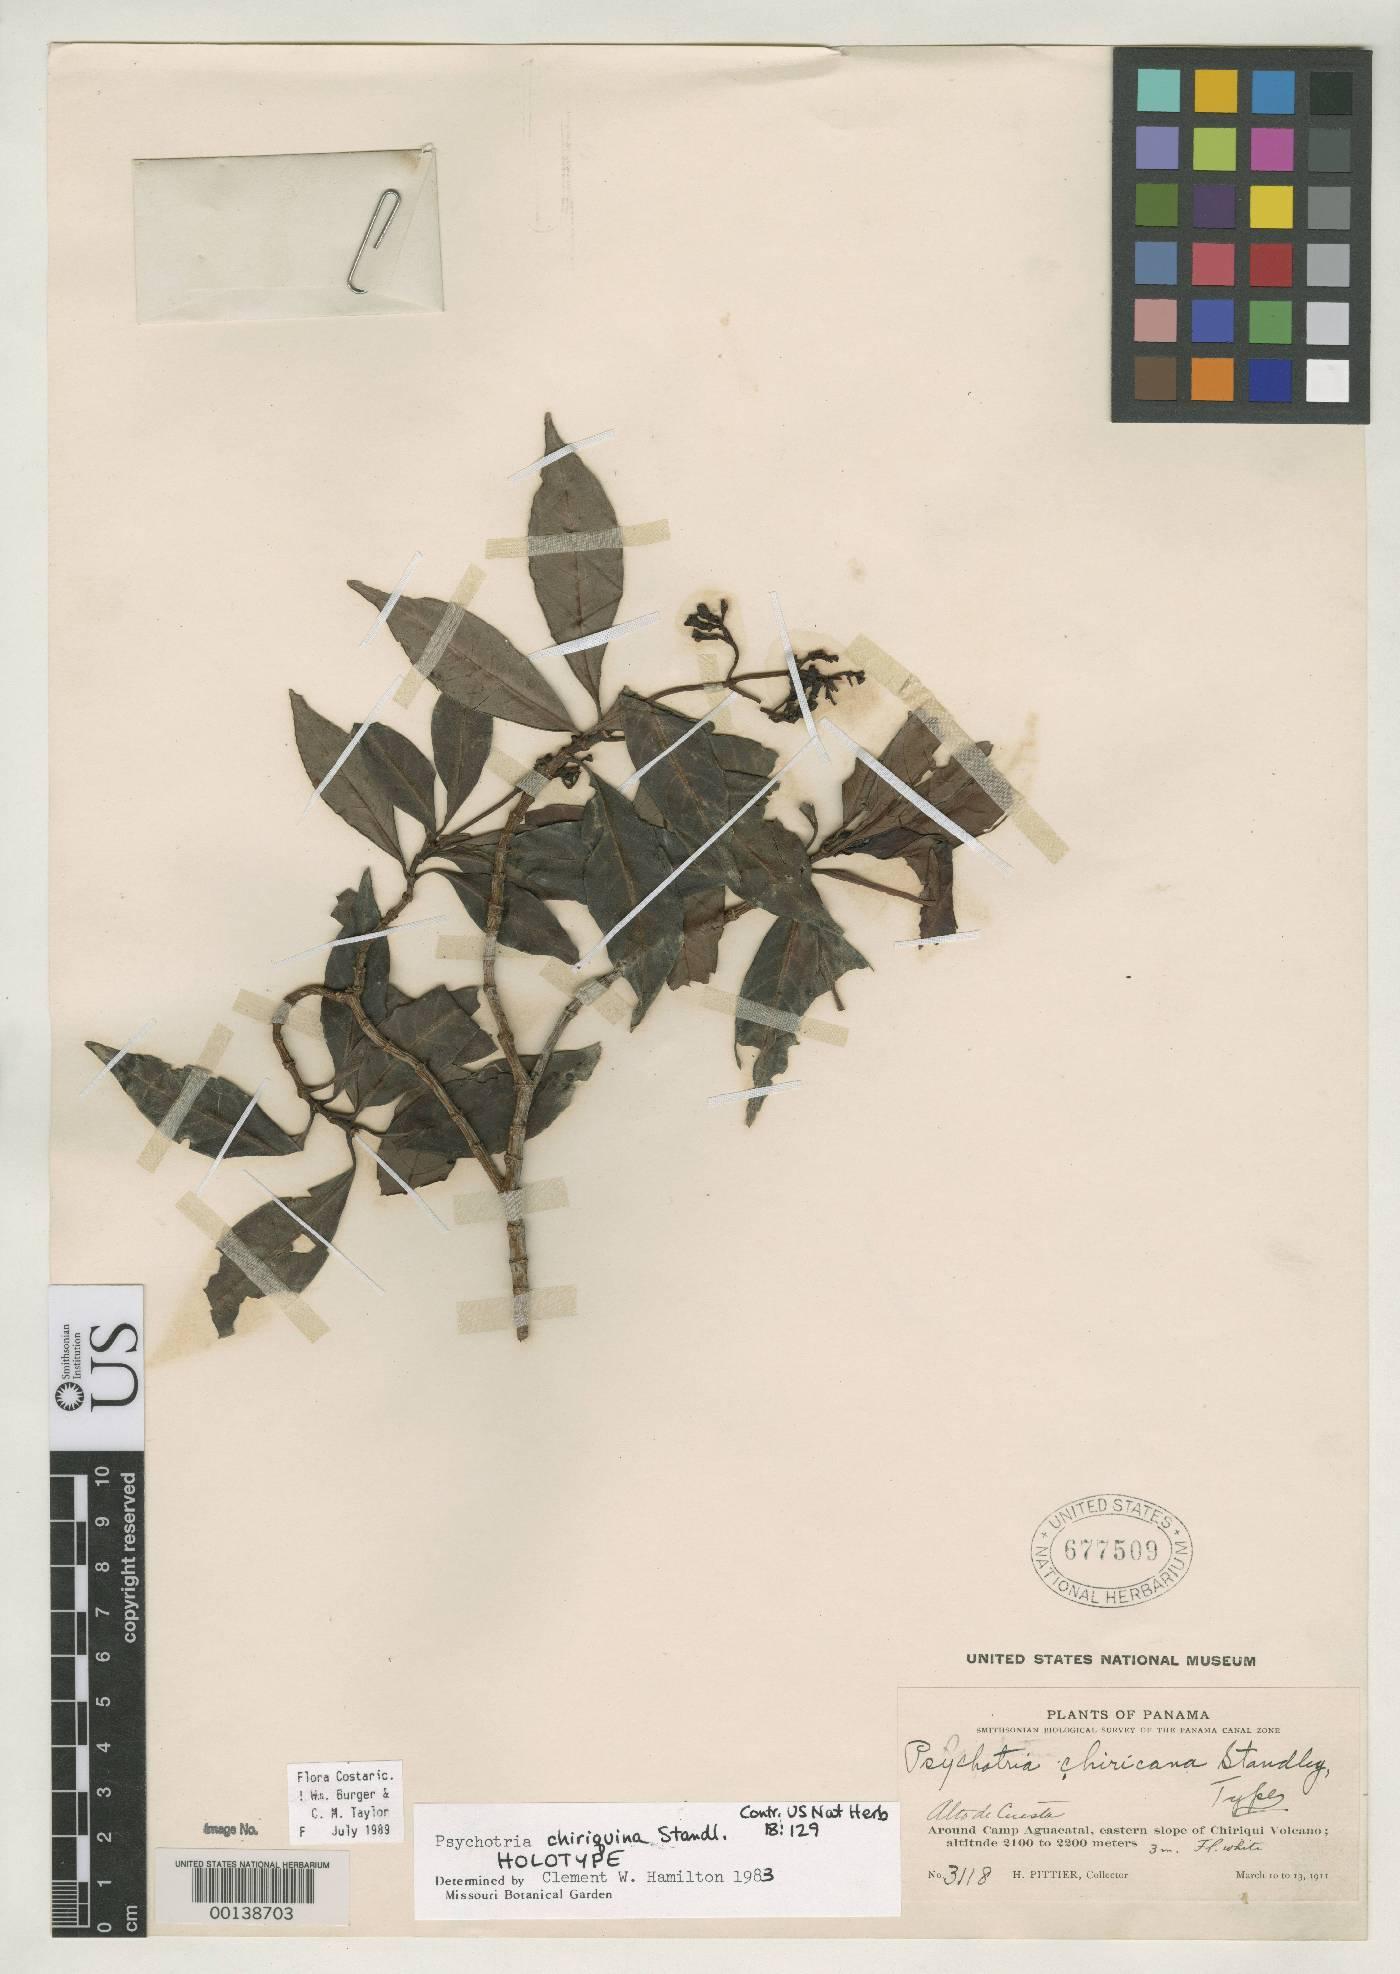 Psychotria chiriquina image